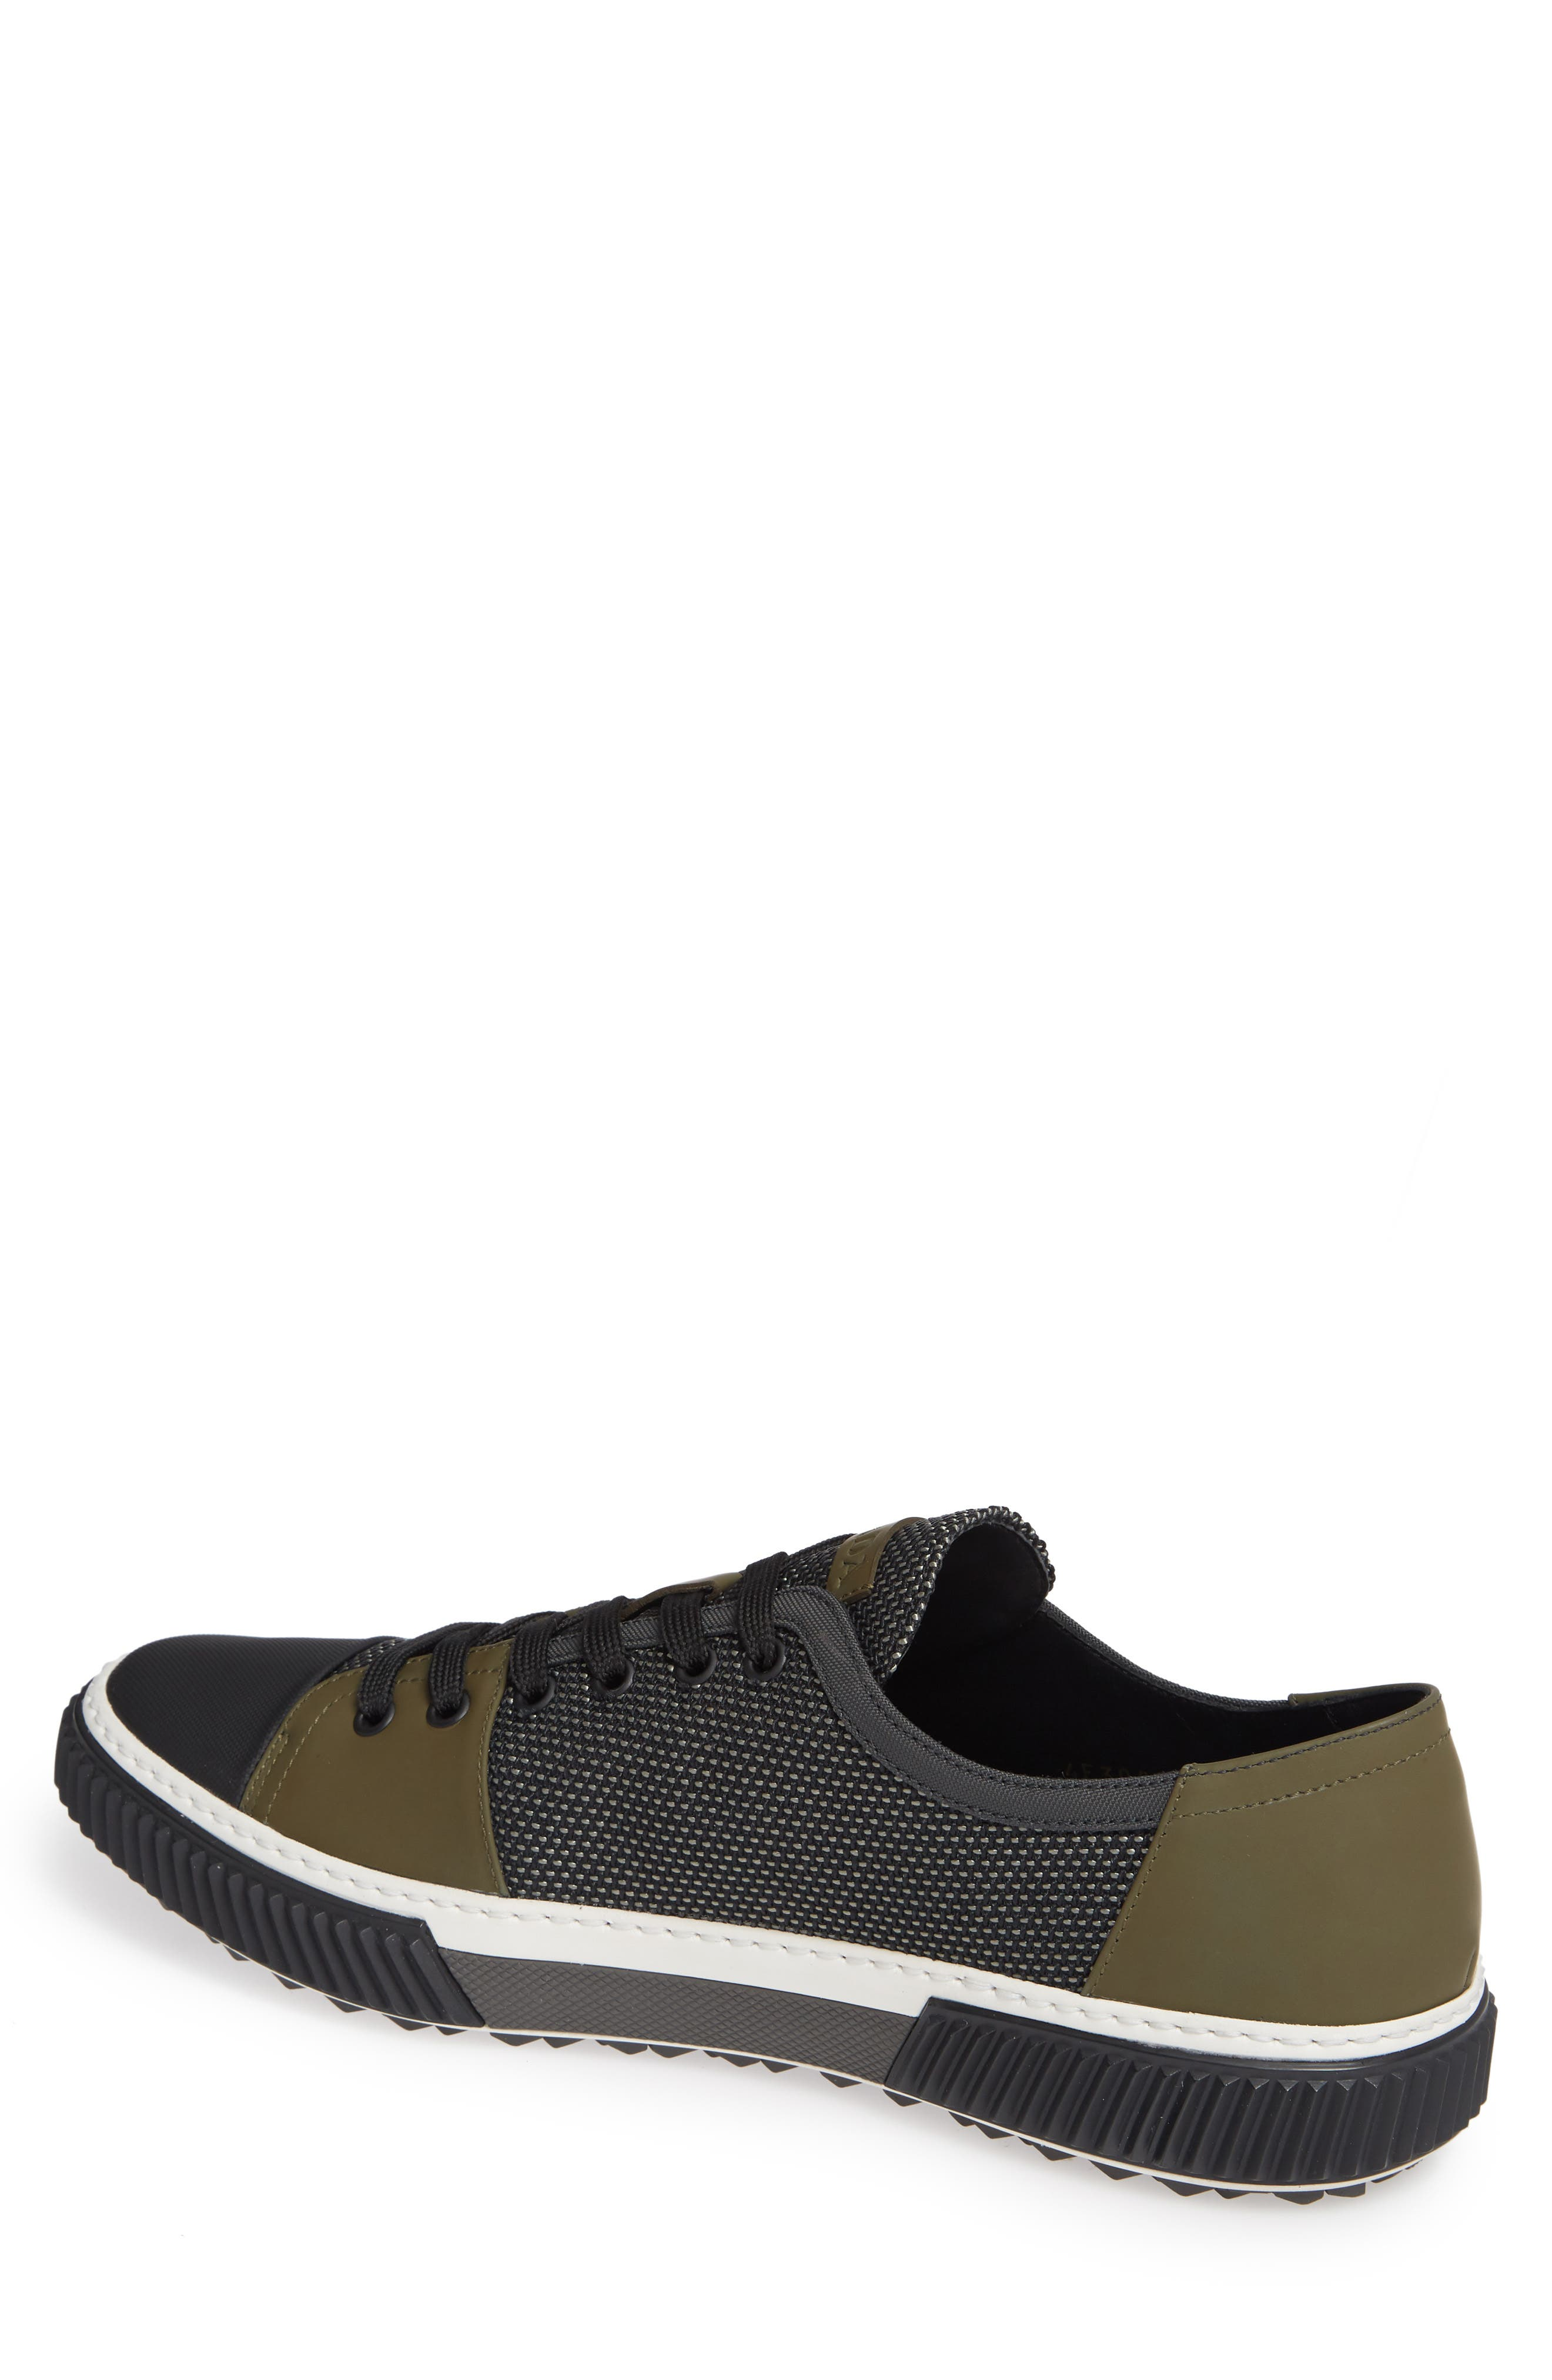 PRADA,                             Linea Rossa Sneaker,                             Alternate thumbnail 2, color,                             GREY/ BLACK